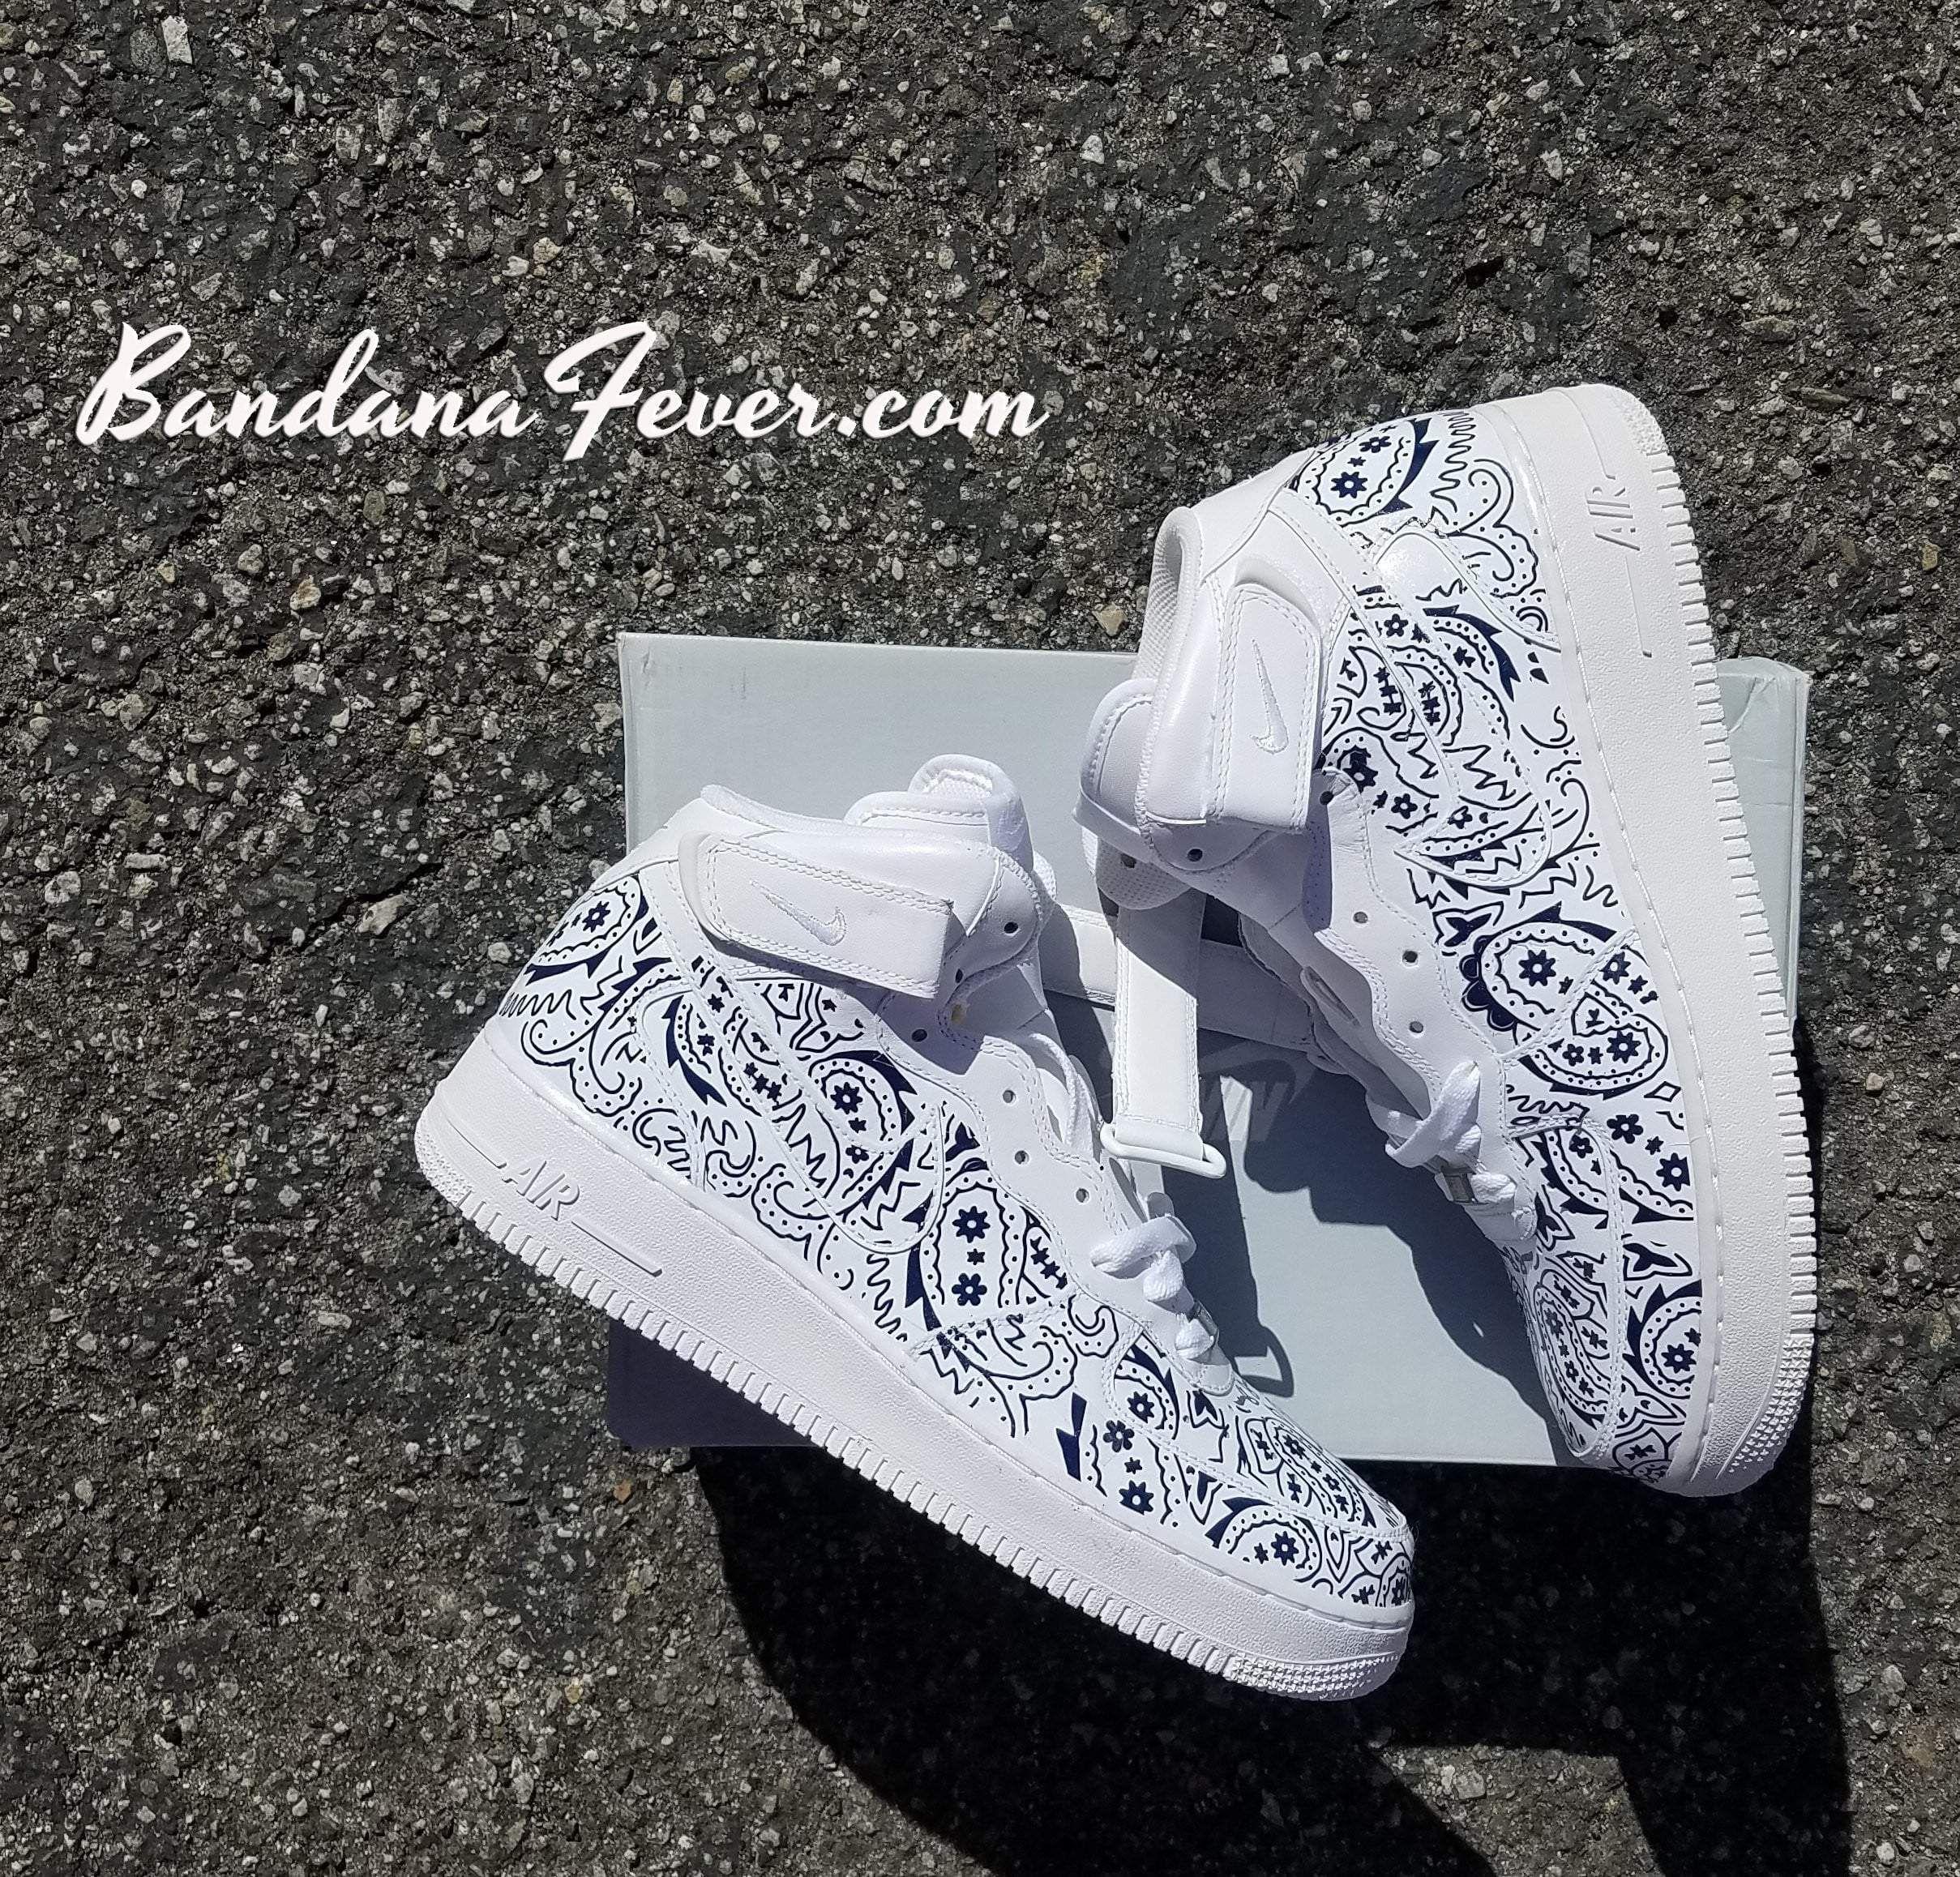 Bandana Fever Navy Bandana White Nike Air Shoes Size 10 5 Sneakers La Losangeles Streetfashion Bandanafever Ba Custom Nike Shoes Mid Top Shoes Nike Air